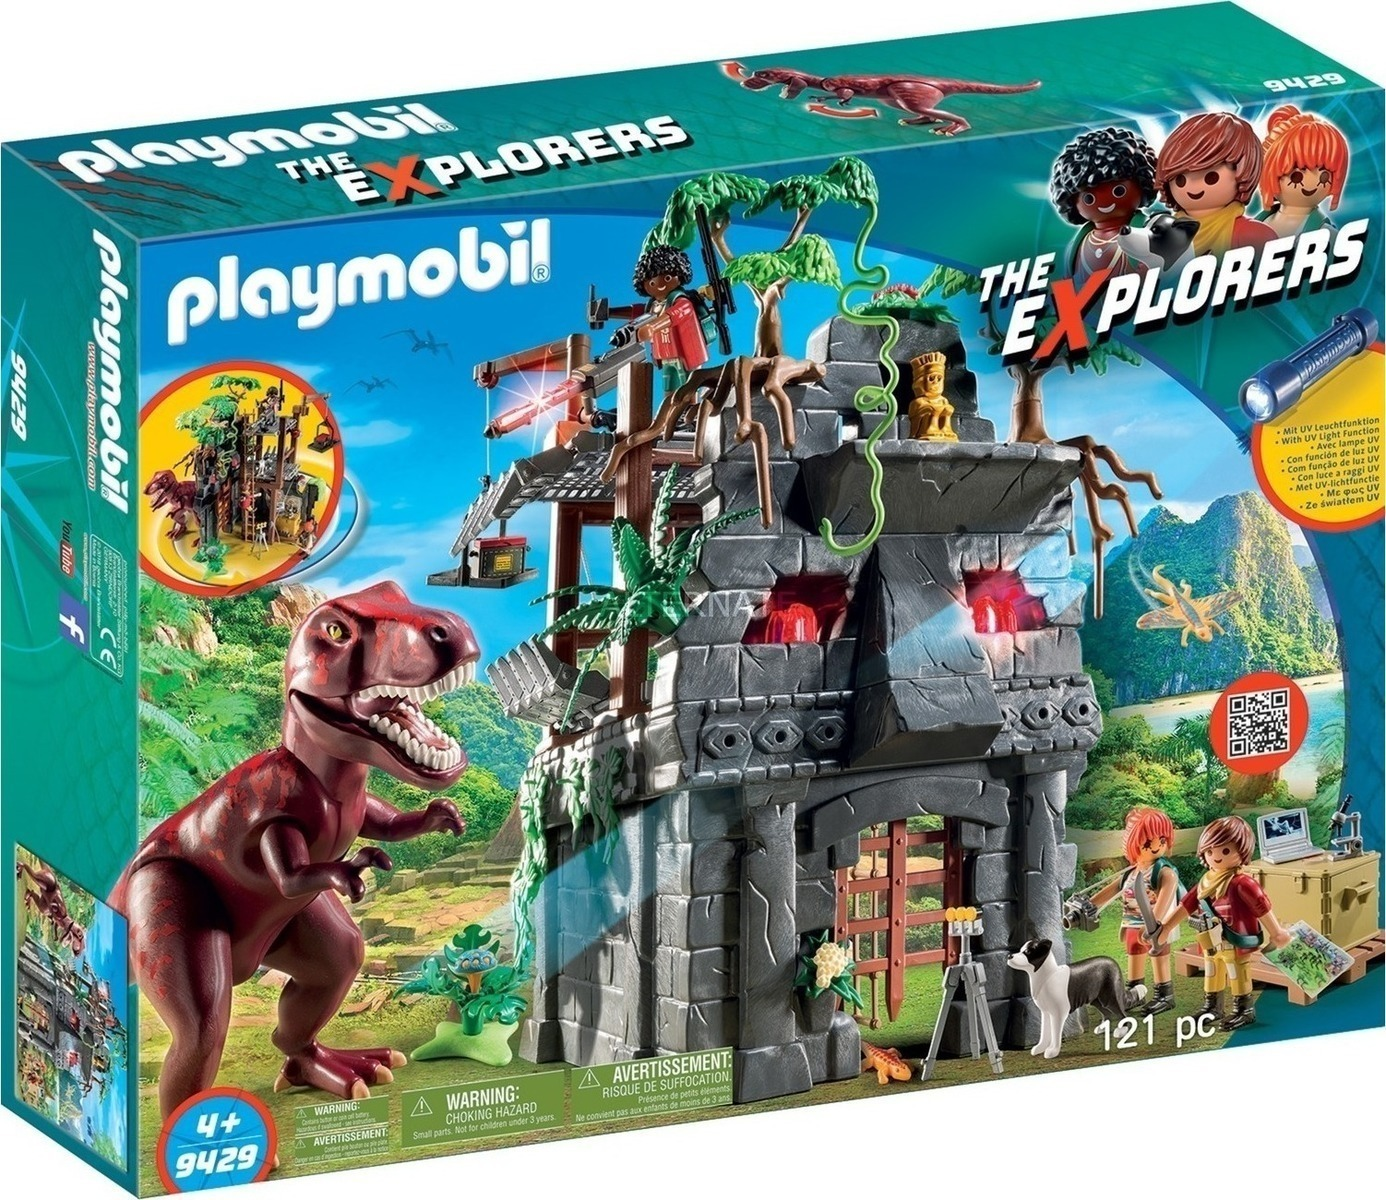 Playmobil The Explorers: Αρχηγείο των Explorers και Τ-Ρεξ  9429